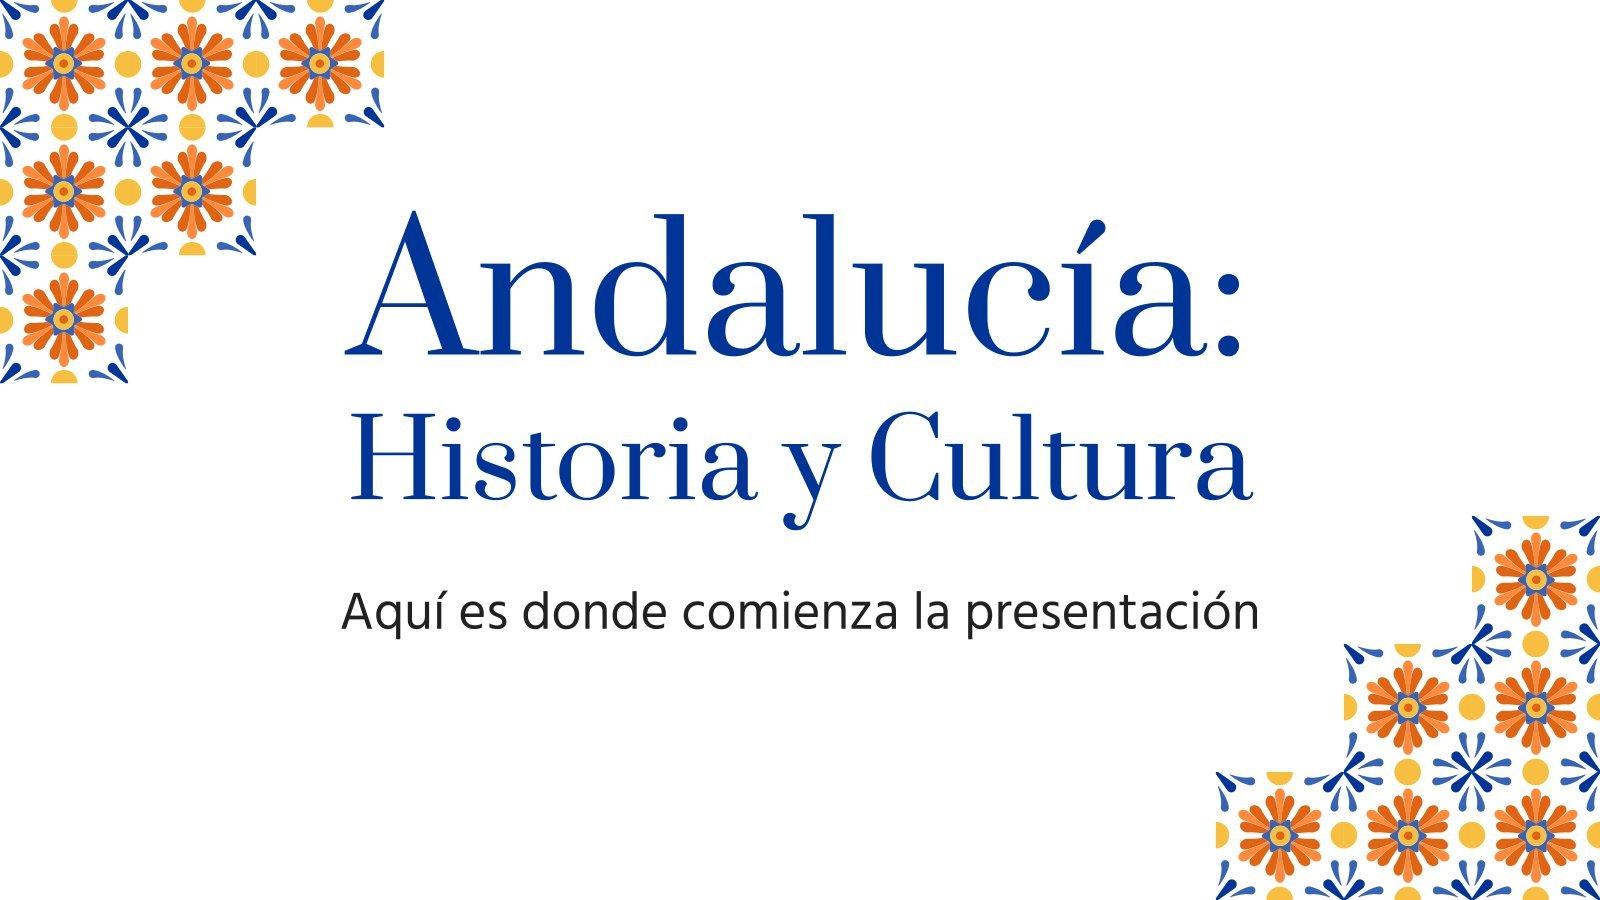 Andalucía: Historia y Cultura : Modèles de présentation